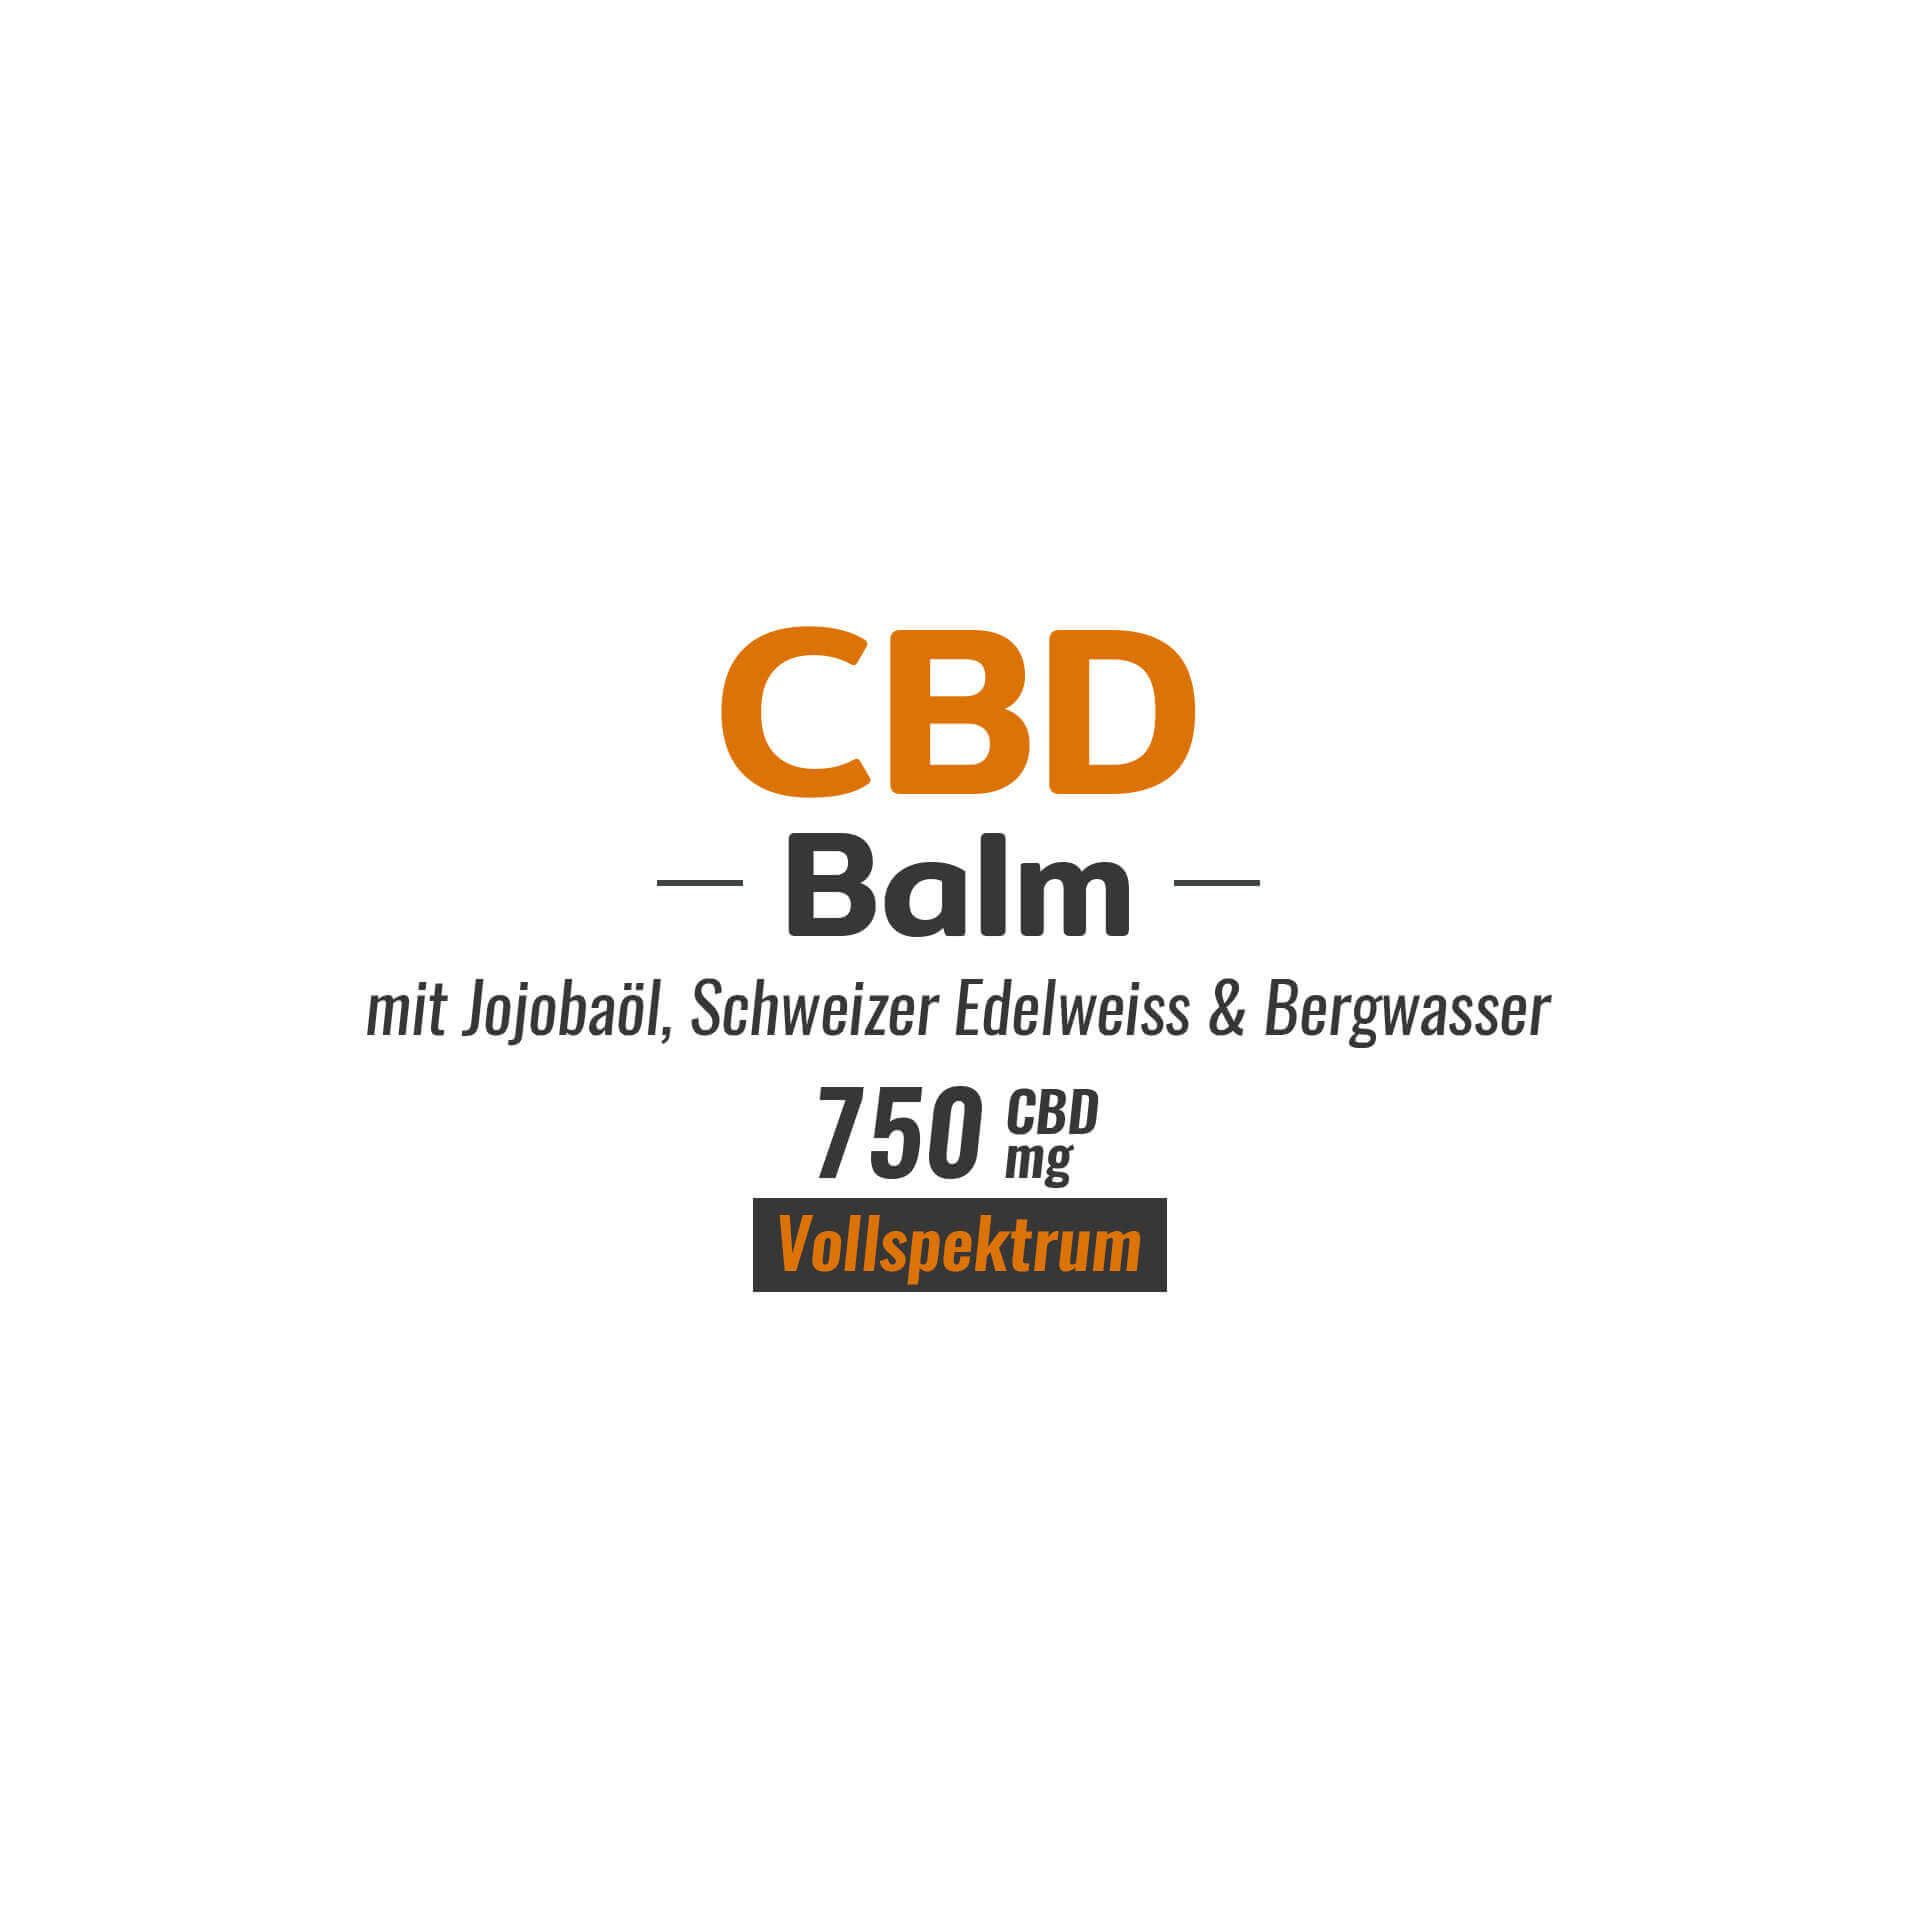 CBD Balm 750mg Cannabidiol